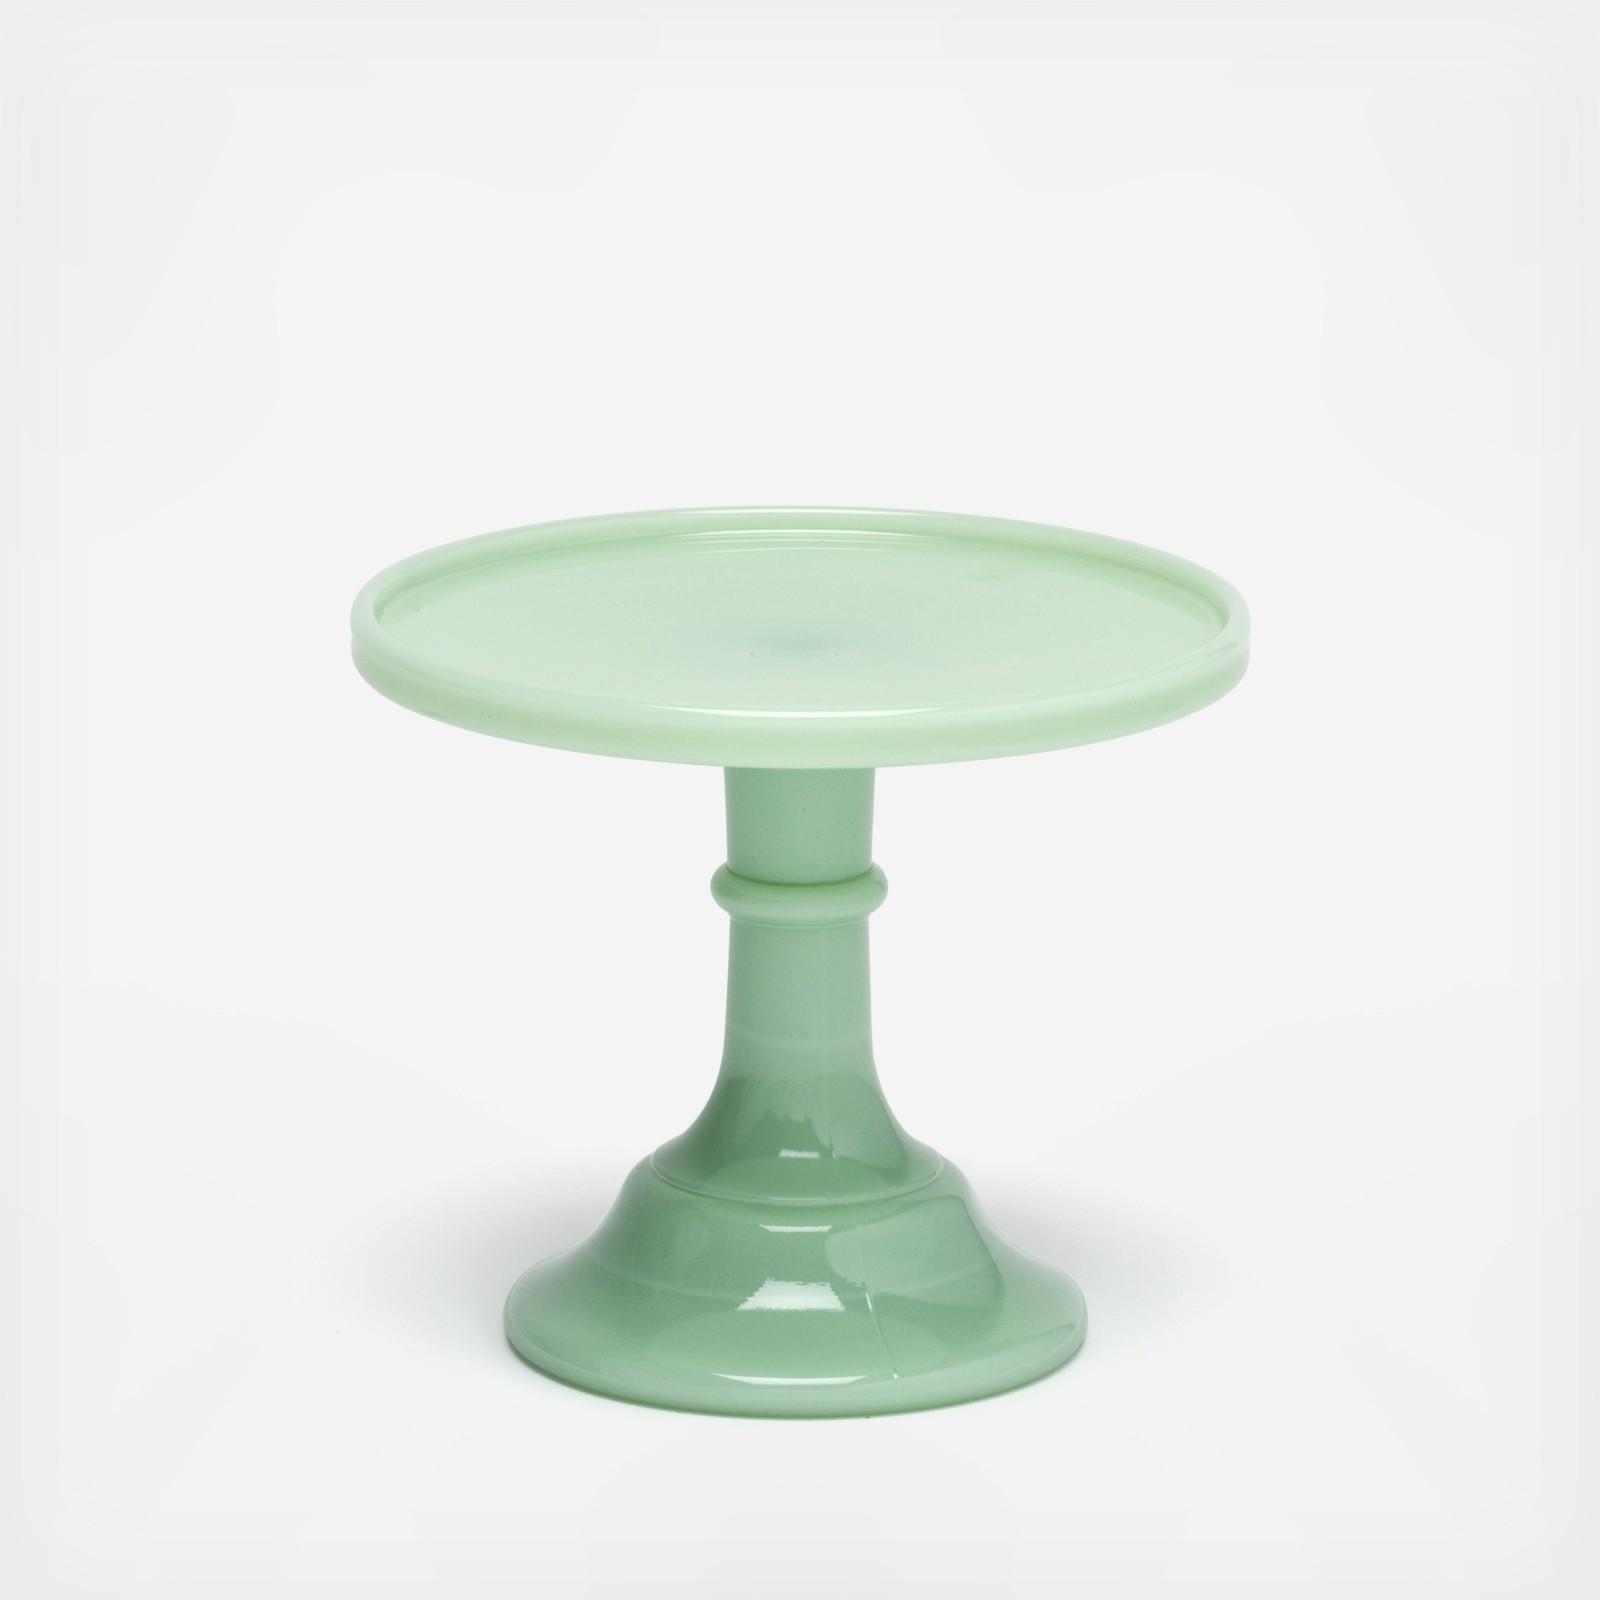 & Mini Cake Stand | Zola